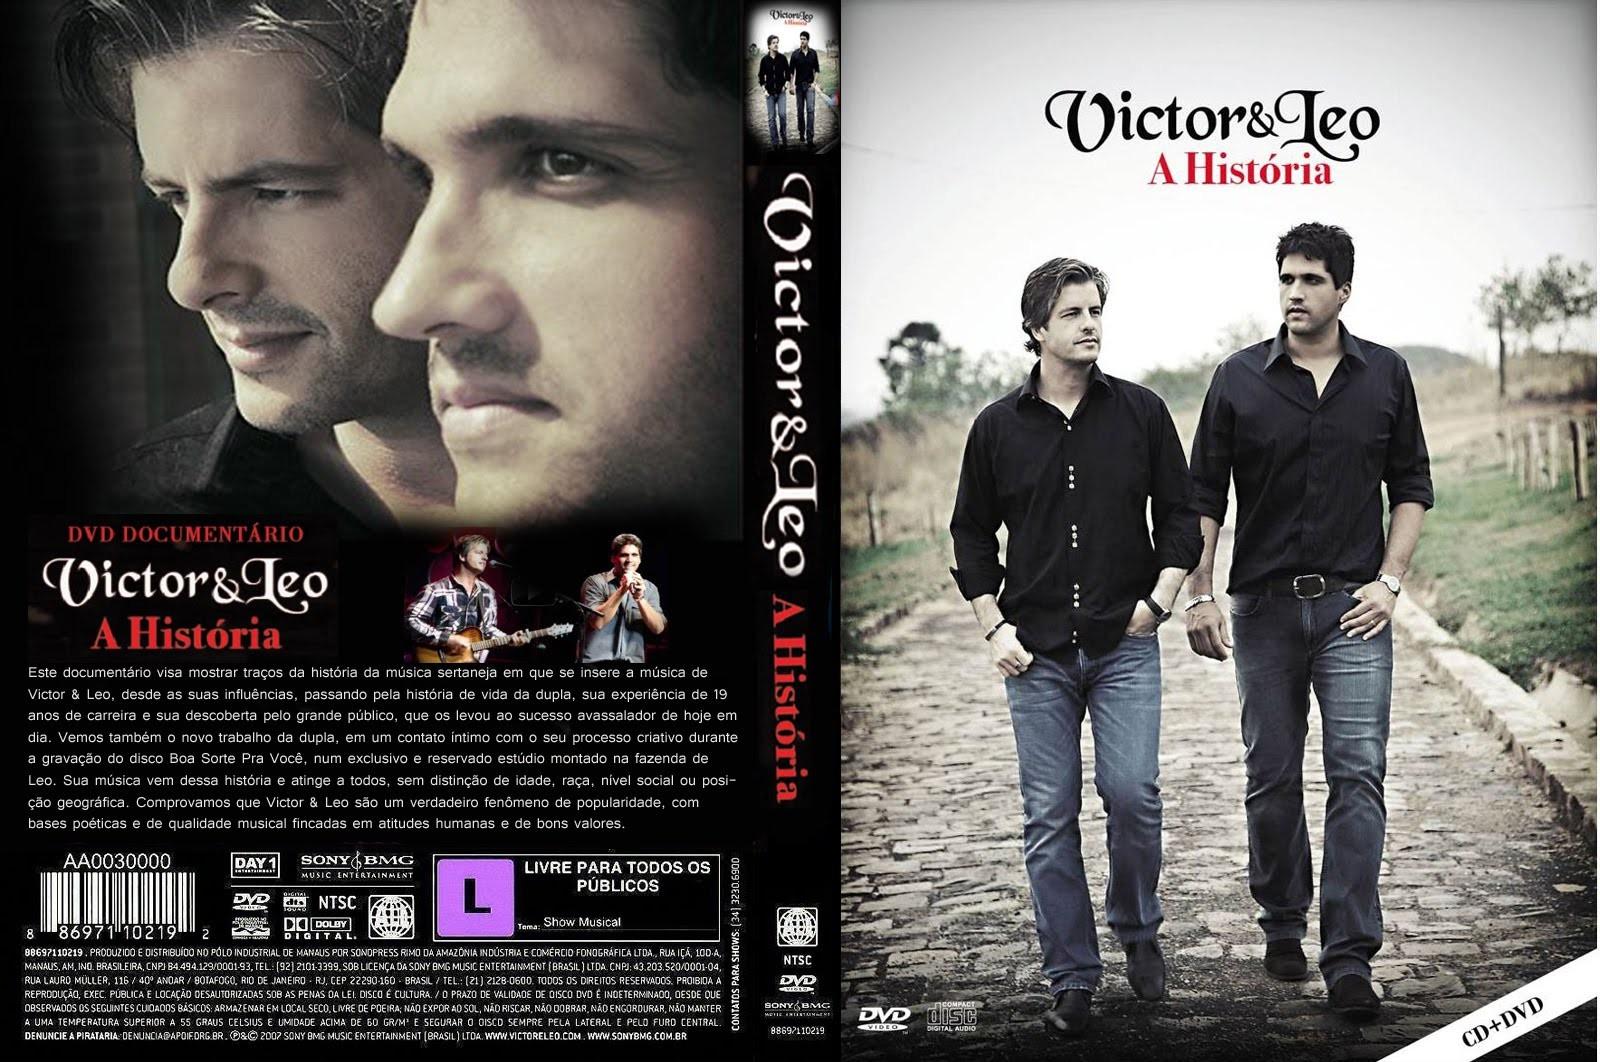 Download Victor e Léo A História DVDRip Nacional Victor 2BLeo 2BA 2BHistoria 2BXANDAODOWNLOAD